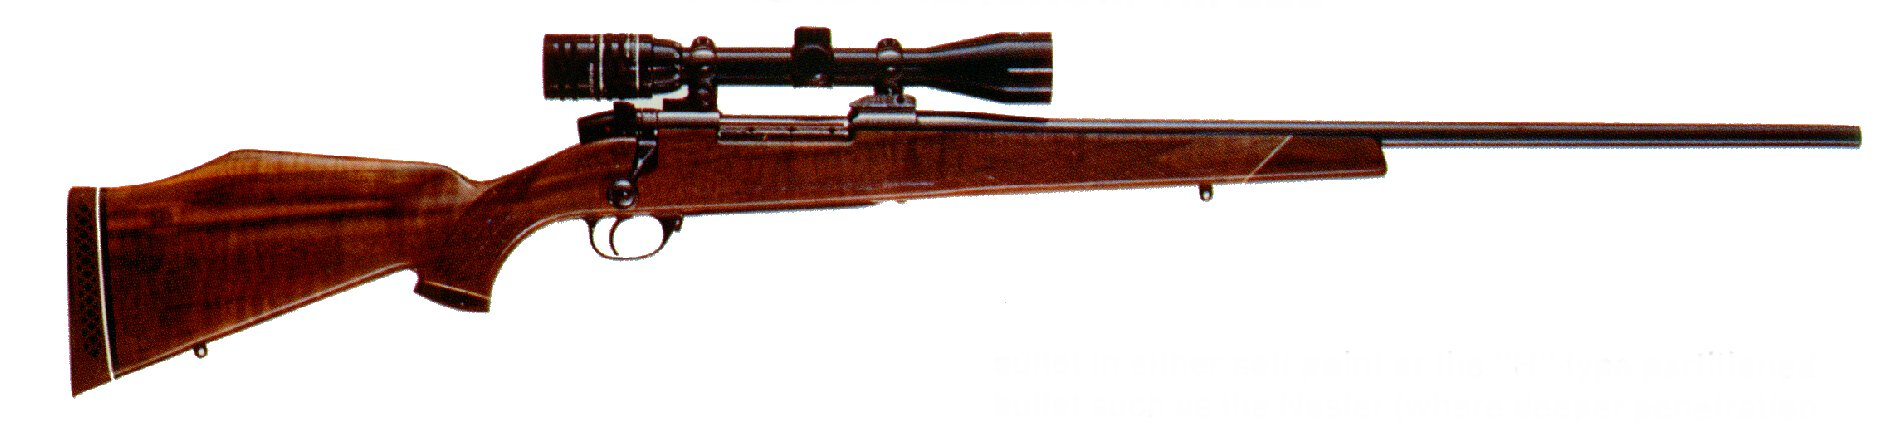 22 Rifle